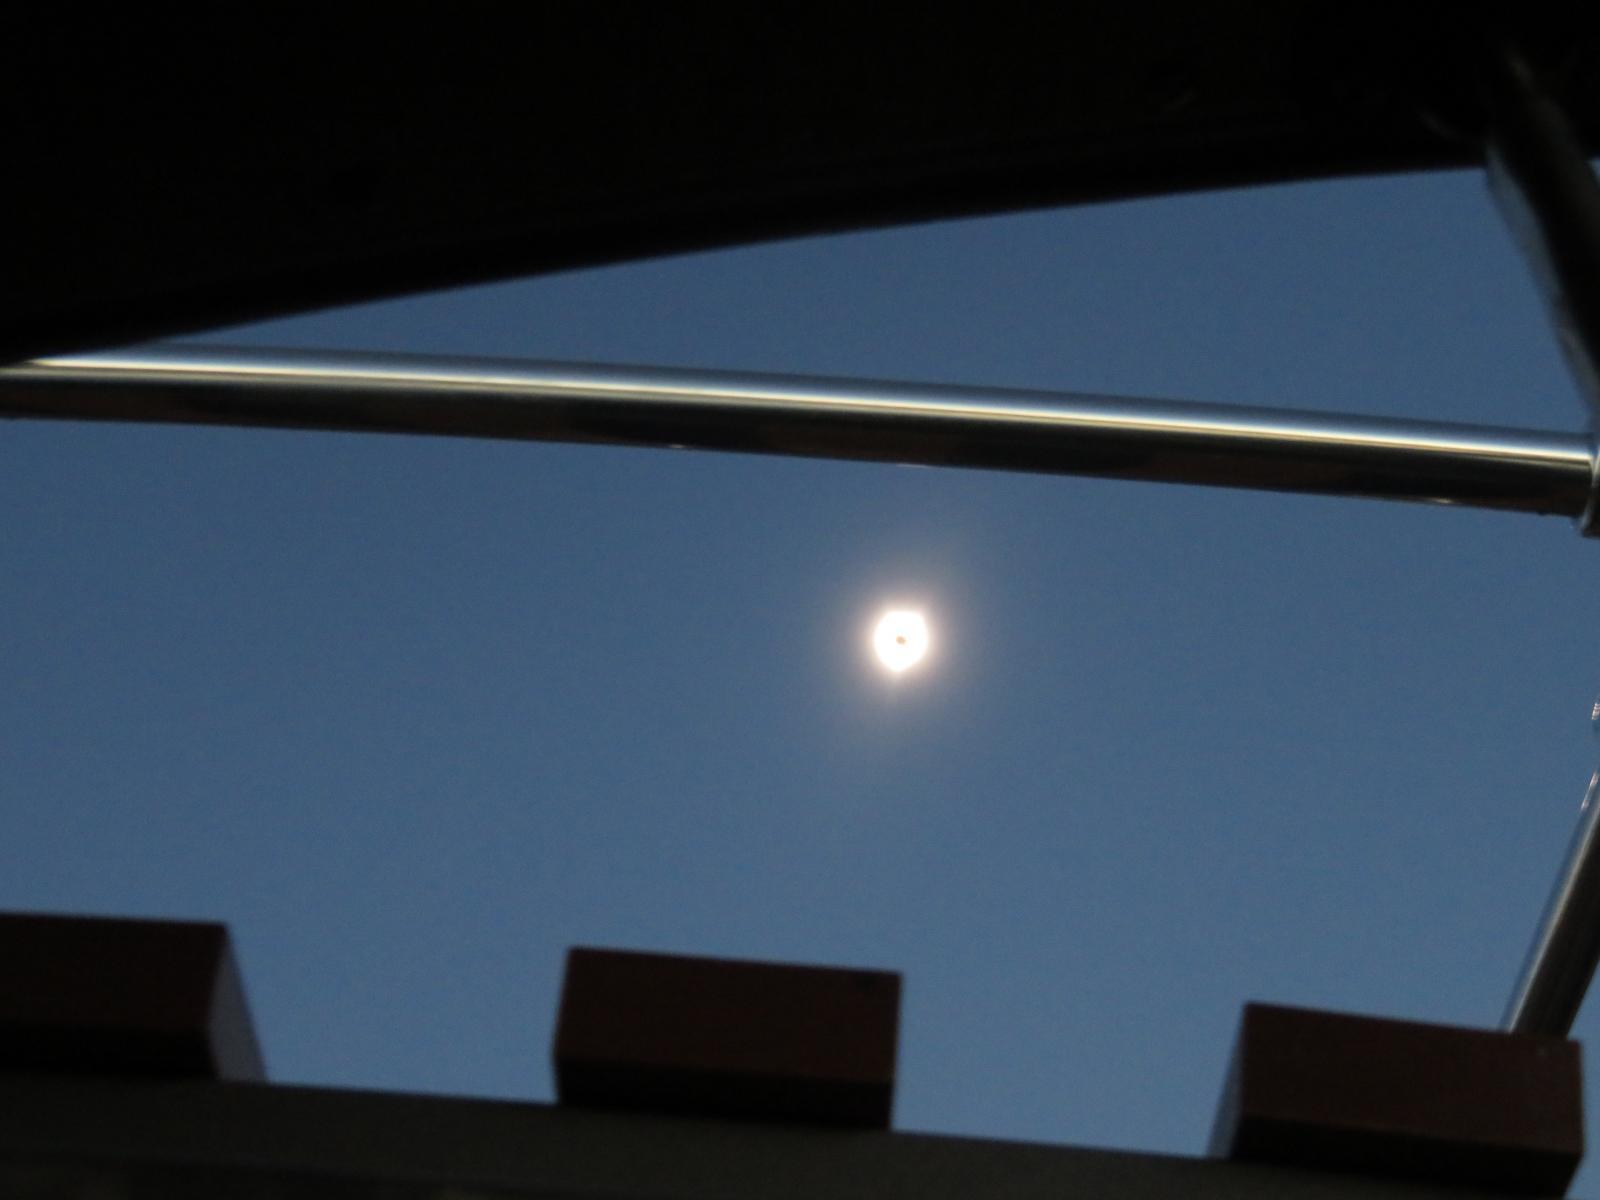 blurry eclipse photo